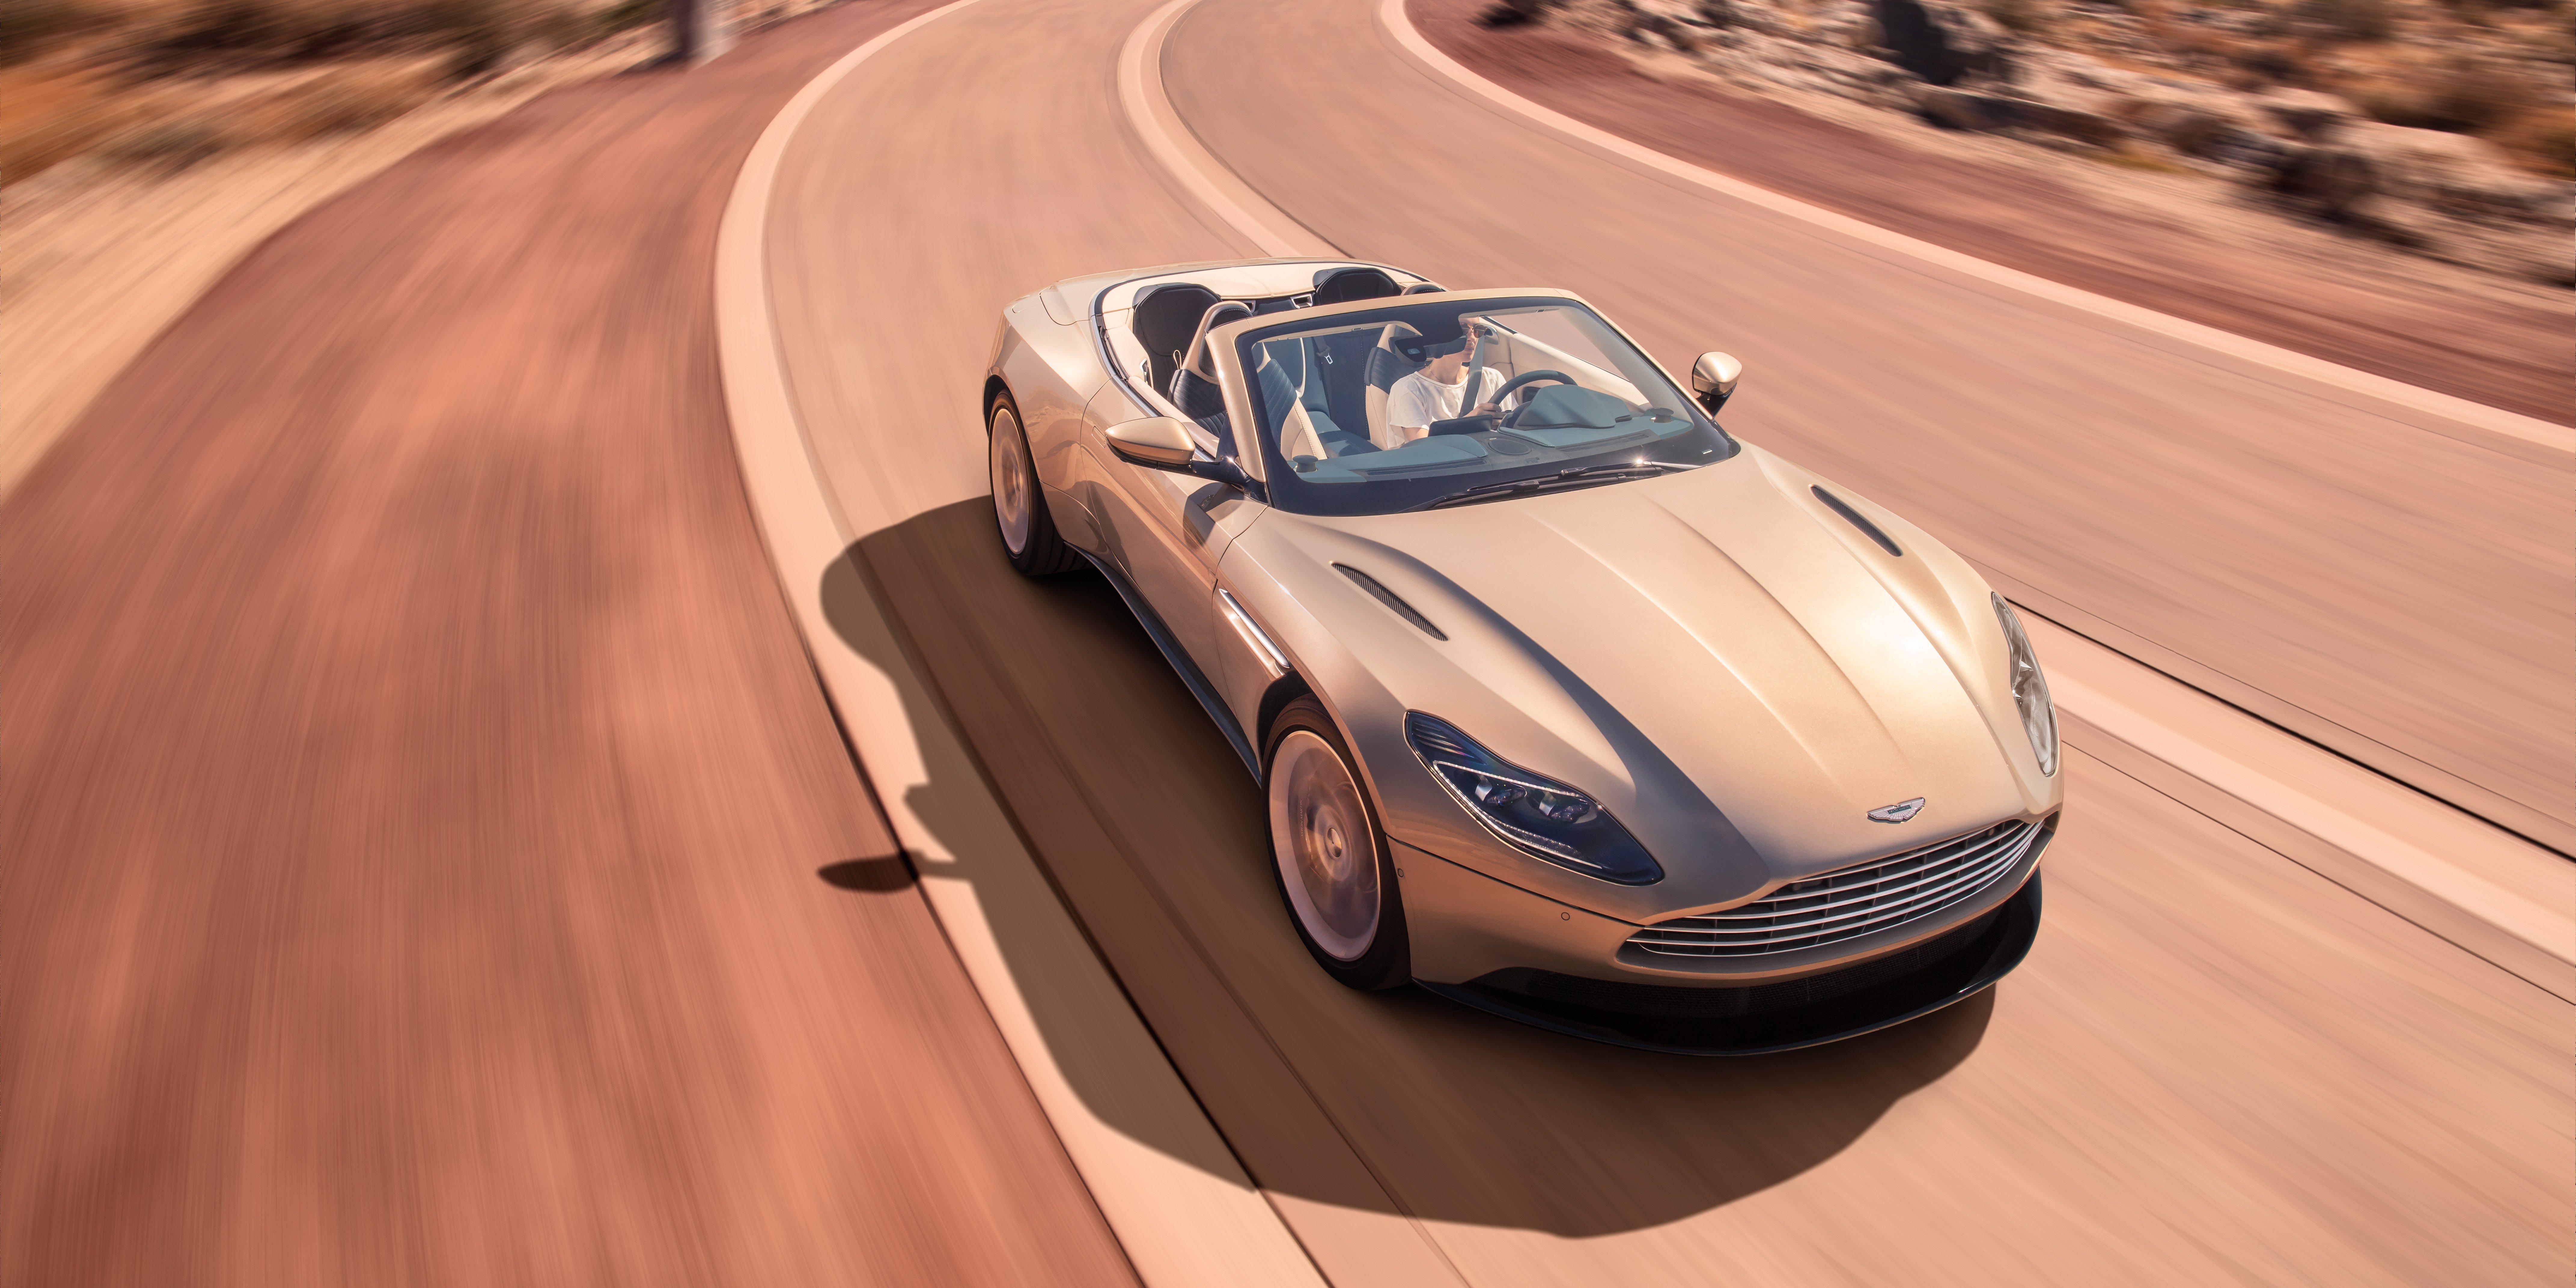 2018 Aston Martin Db11 Volante Pricing Caradvice